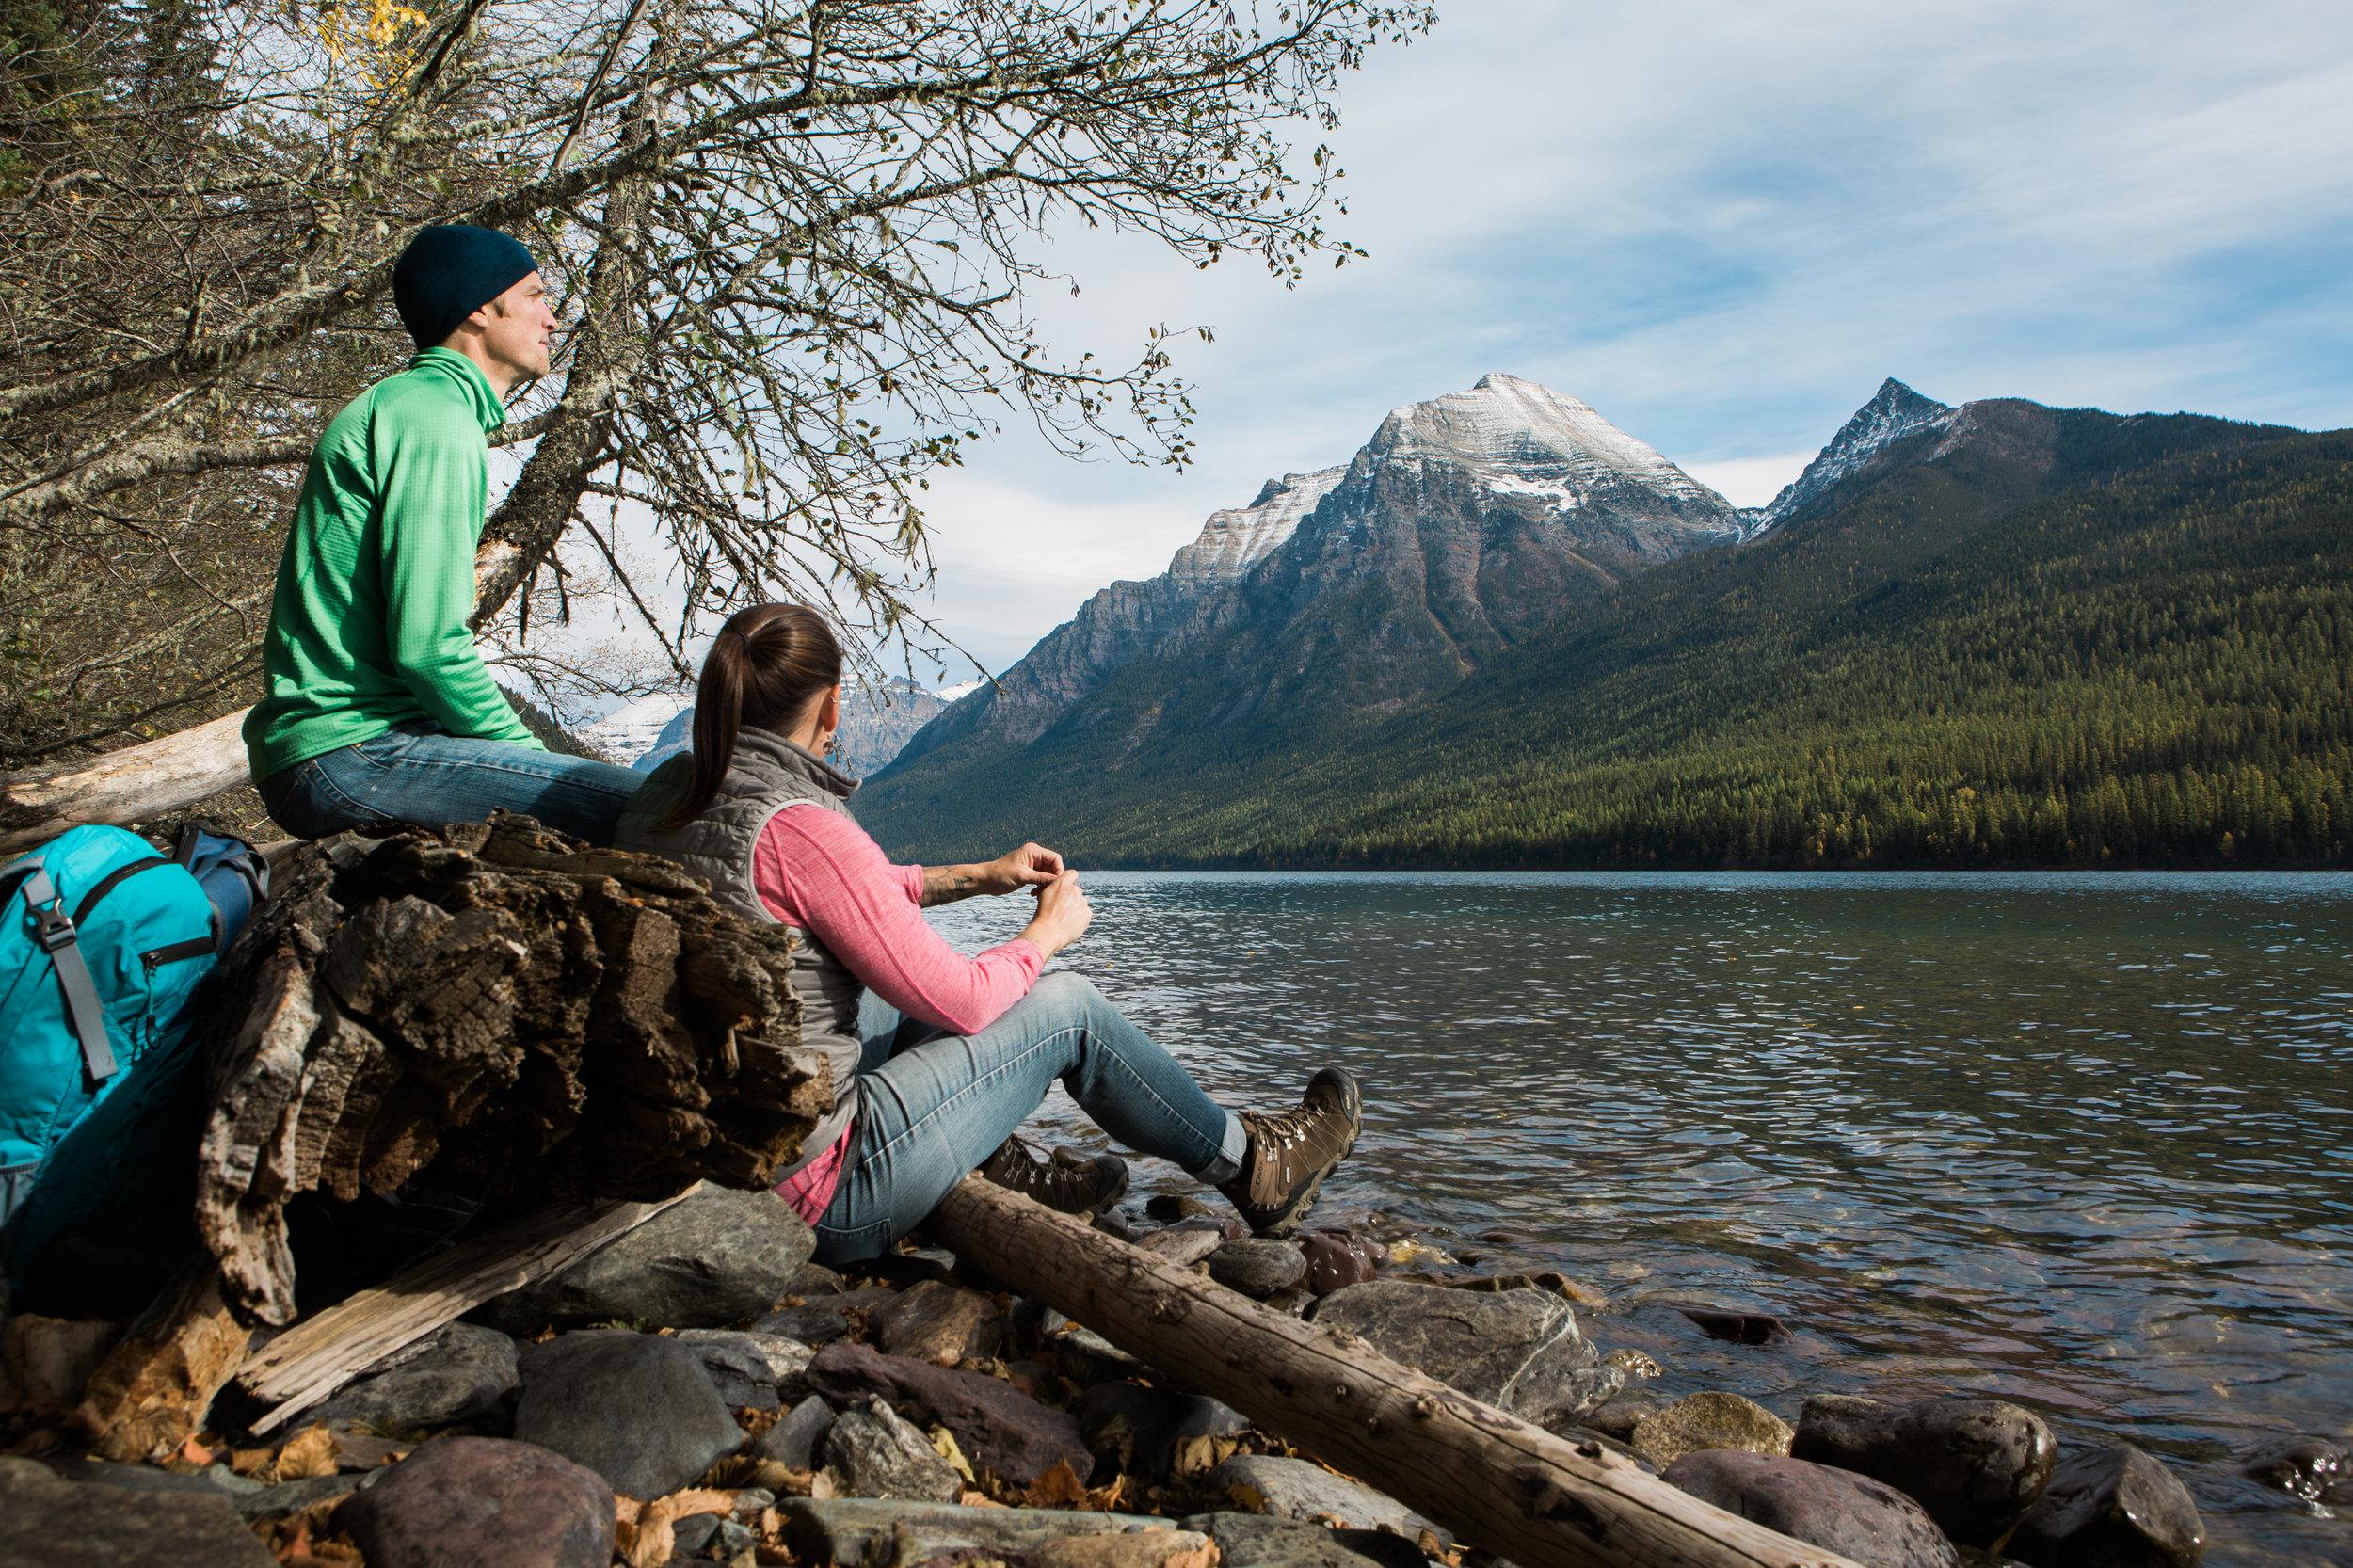 CindyGiovagnoli_outdoor_adventure_photography_Grand_Teton_Yellowstone_Glacier_National_Park_Montana_Wyoming_South_Dakota_Mount_Rushmore_Badlands-012.jpg